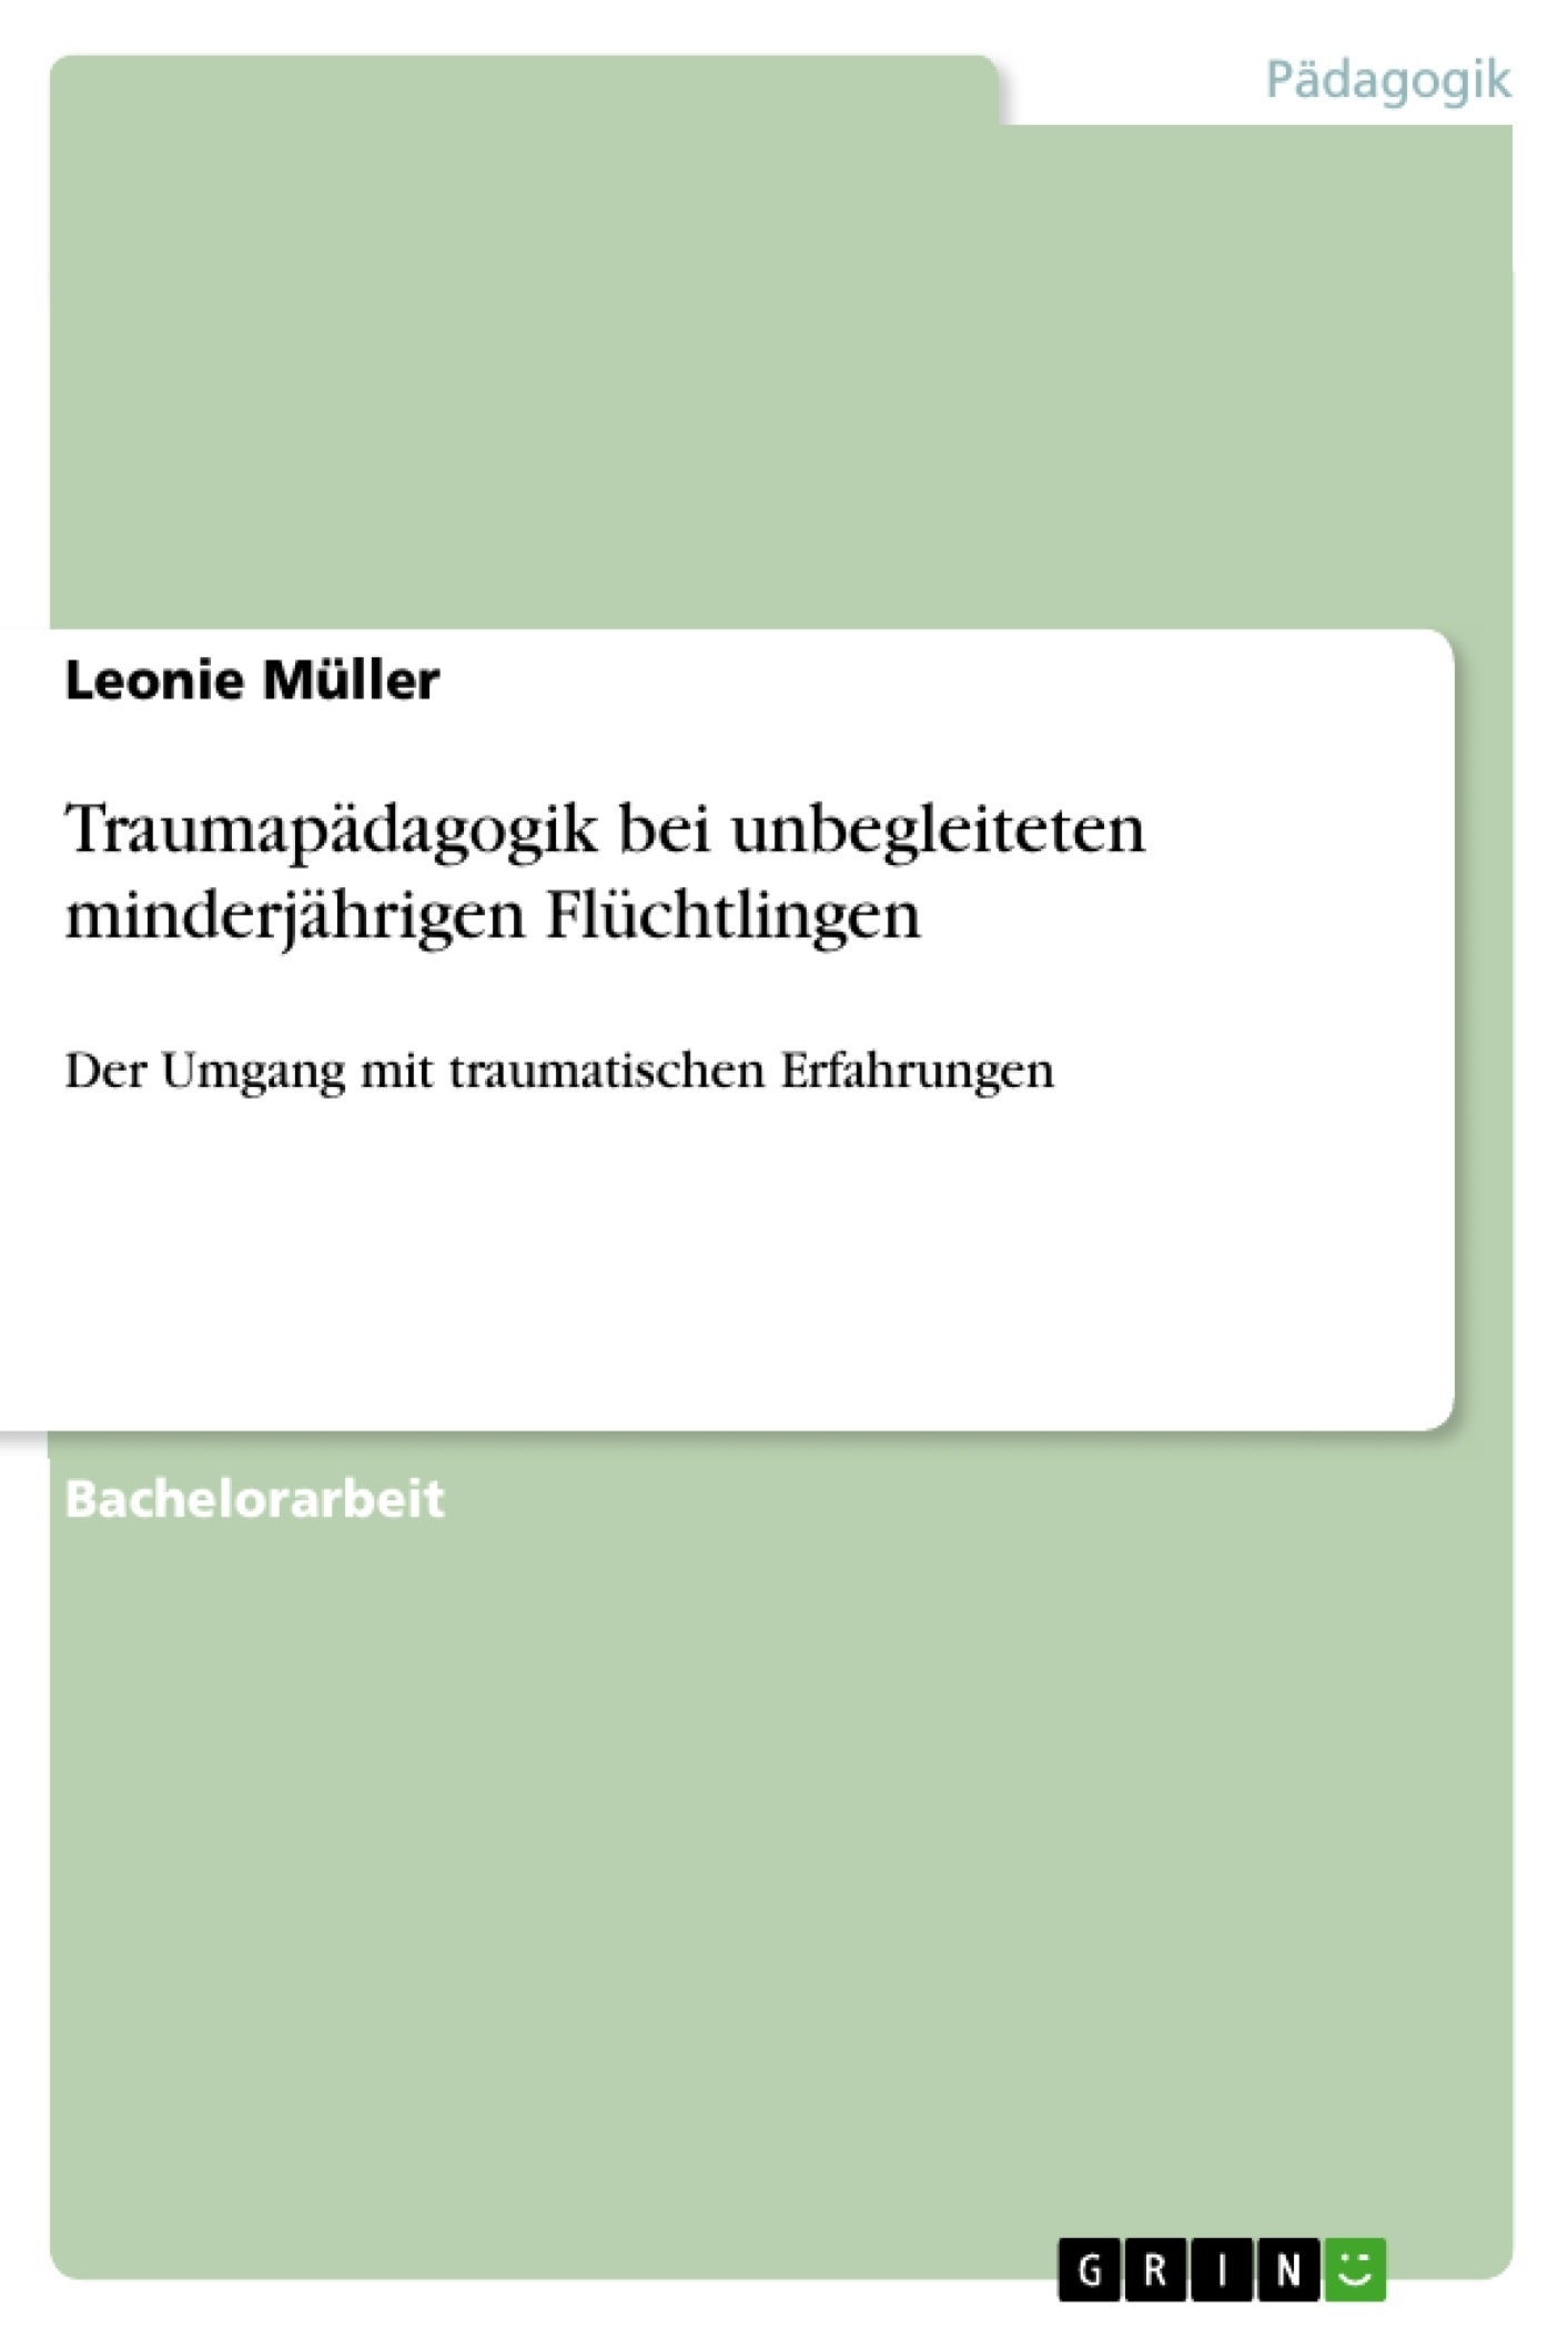 Titel: Traumapädagogik bei unbegleiteten minderjährigen Flüchtlingen